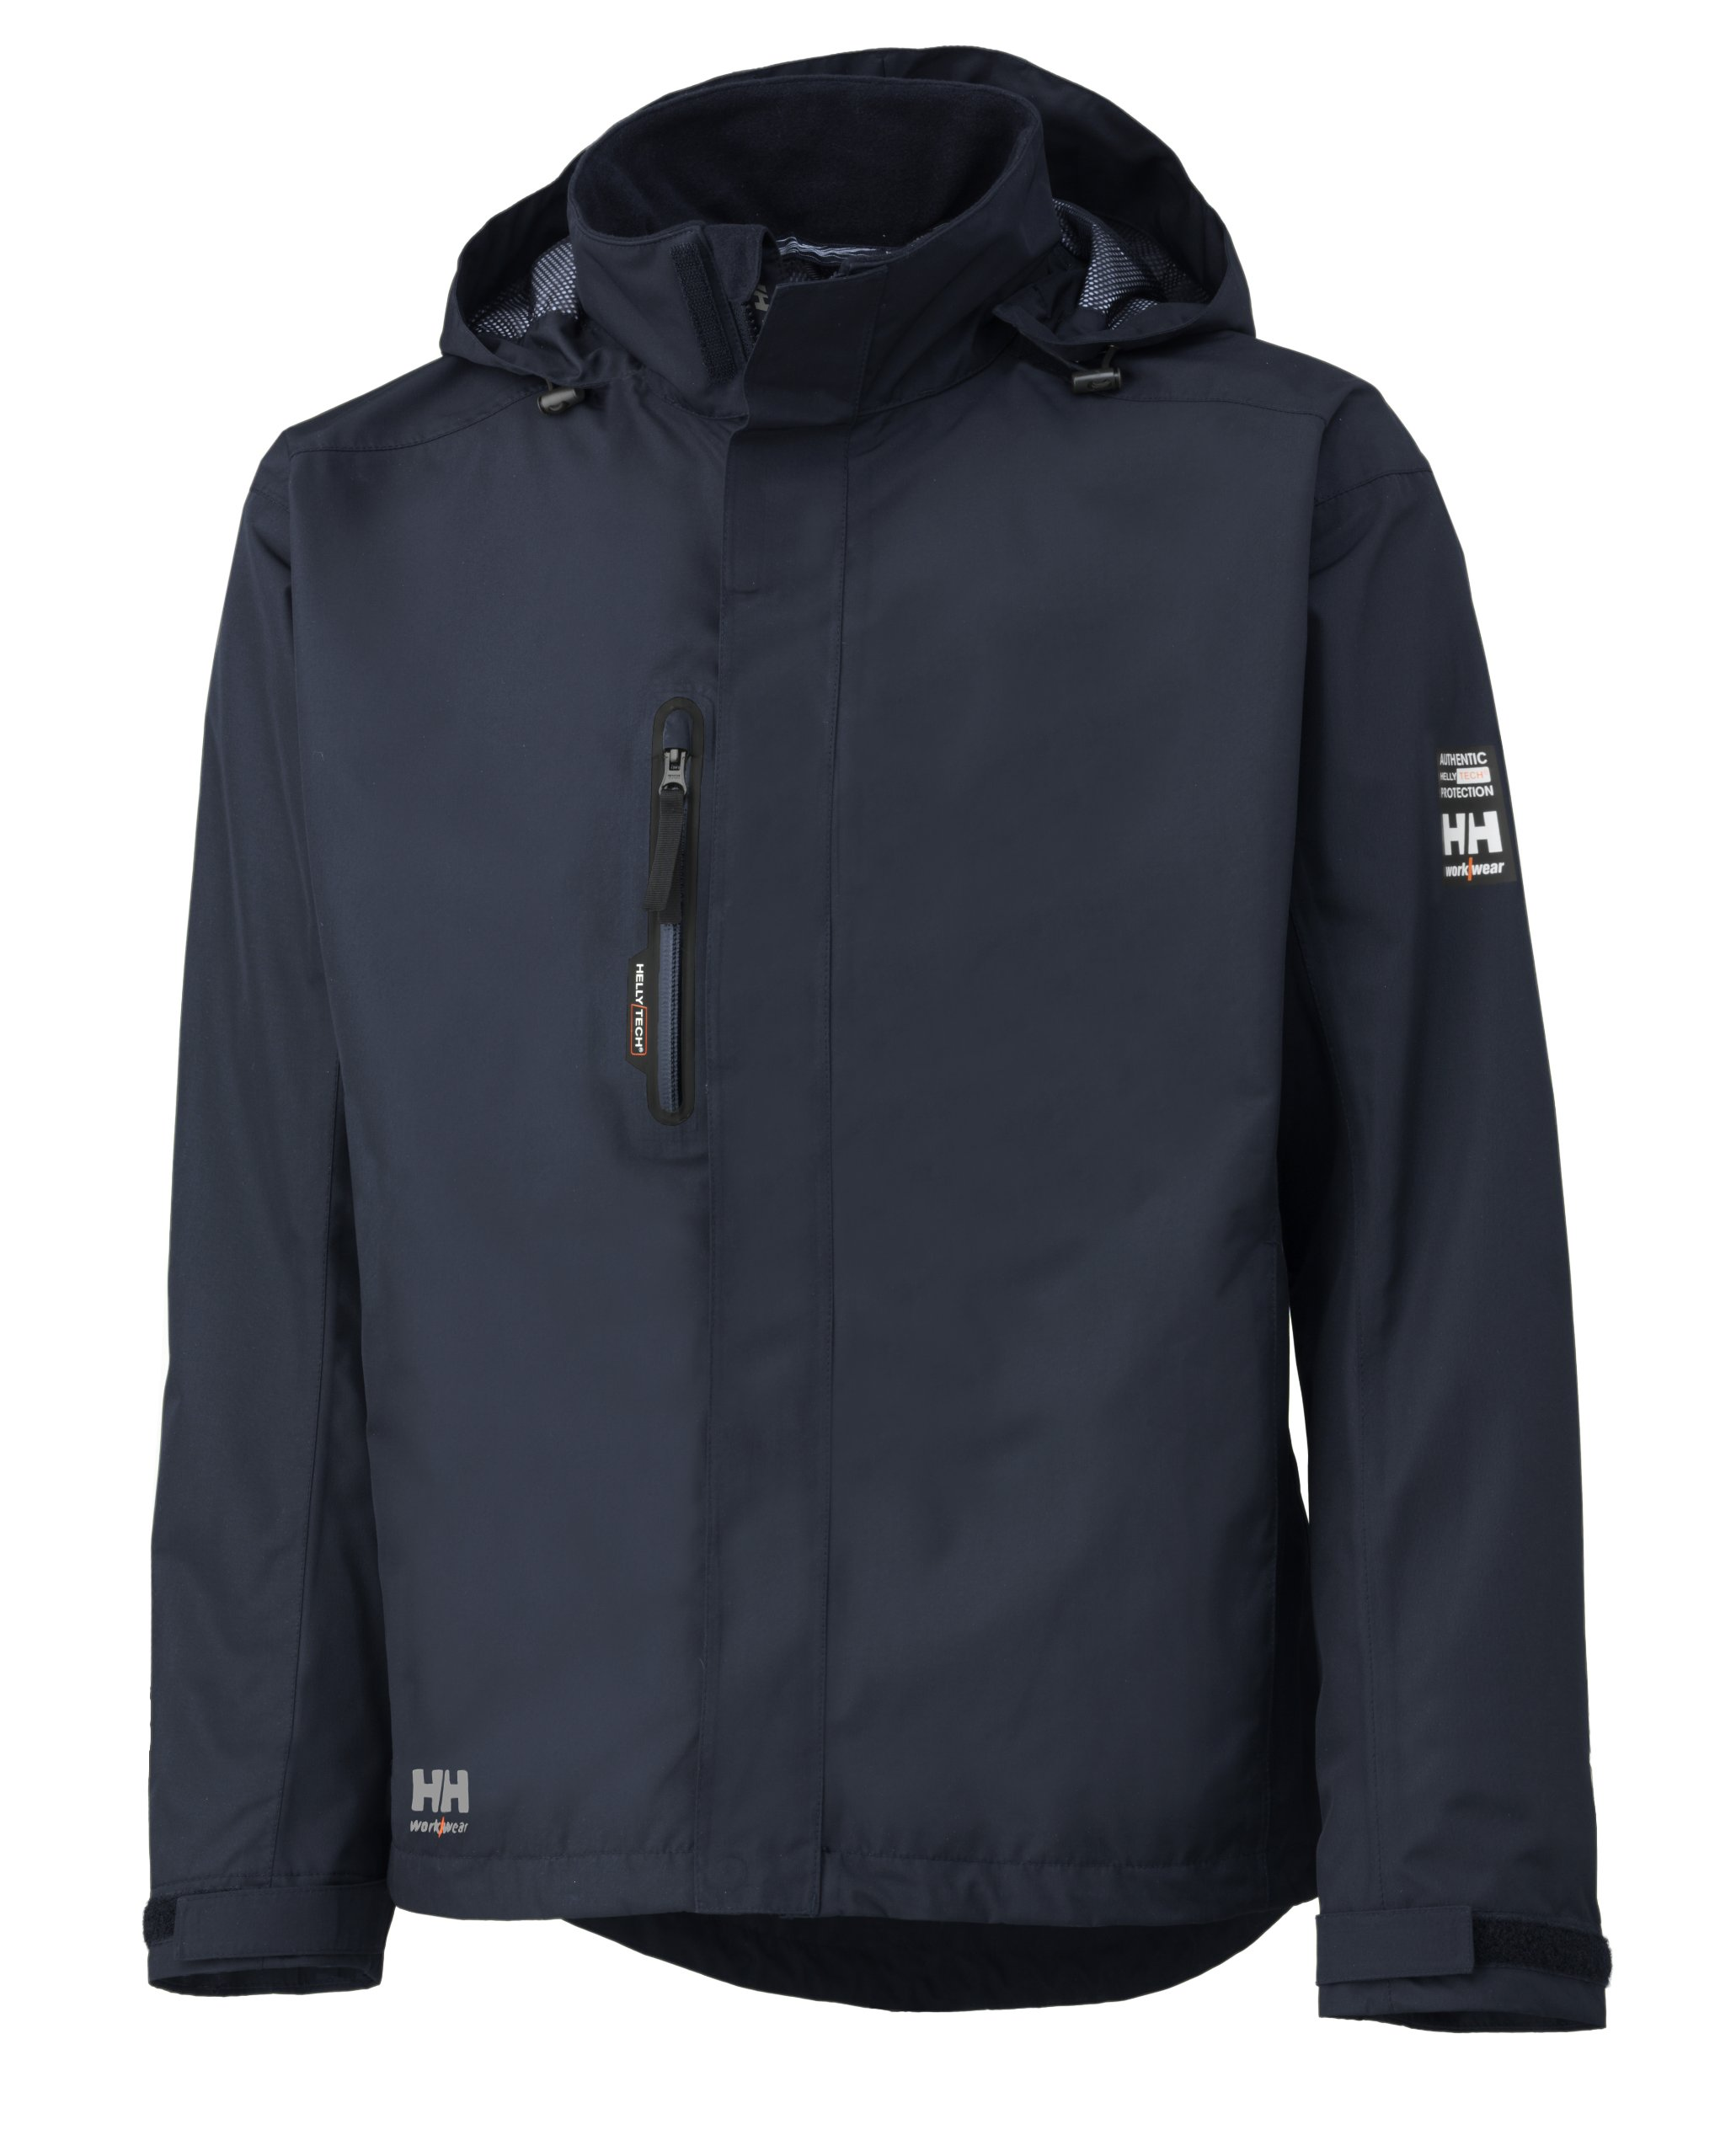 Helly Hansen Workwear Workwear Men's Haag Waterproof, Navy, 4X-Large